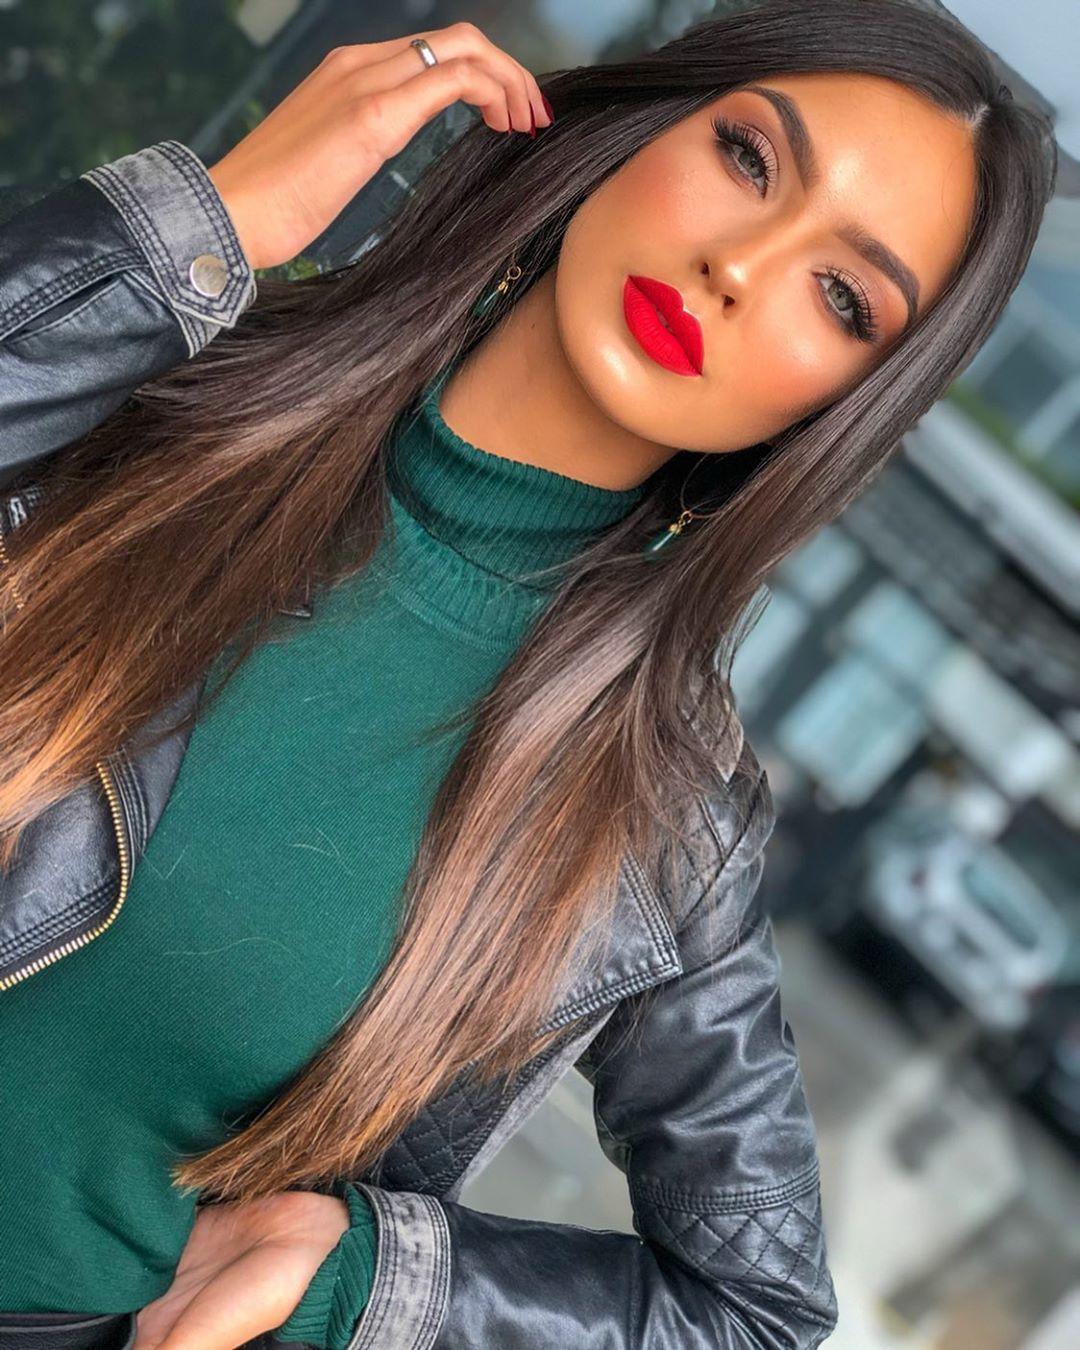 bianca scheren, top 5 de miss brasil universo 2019. 67415610